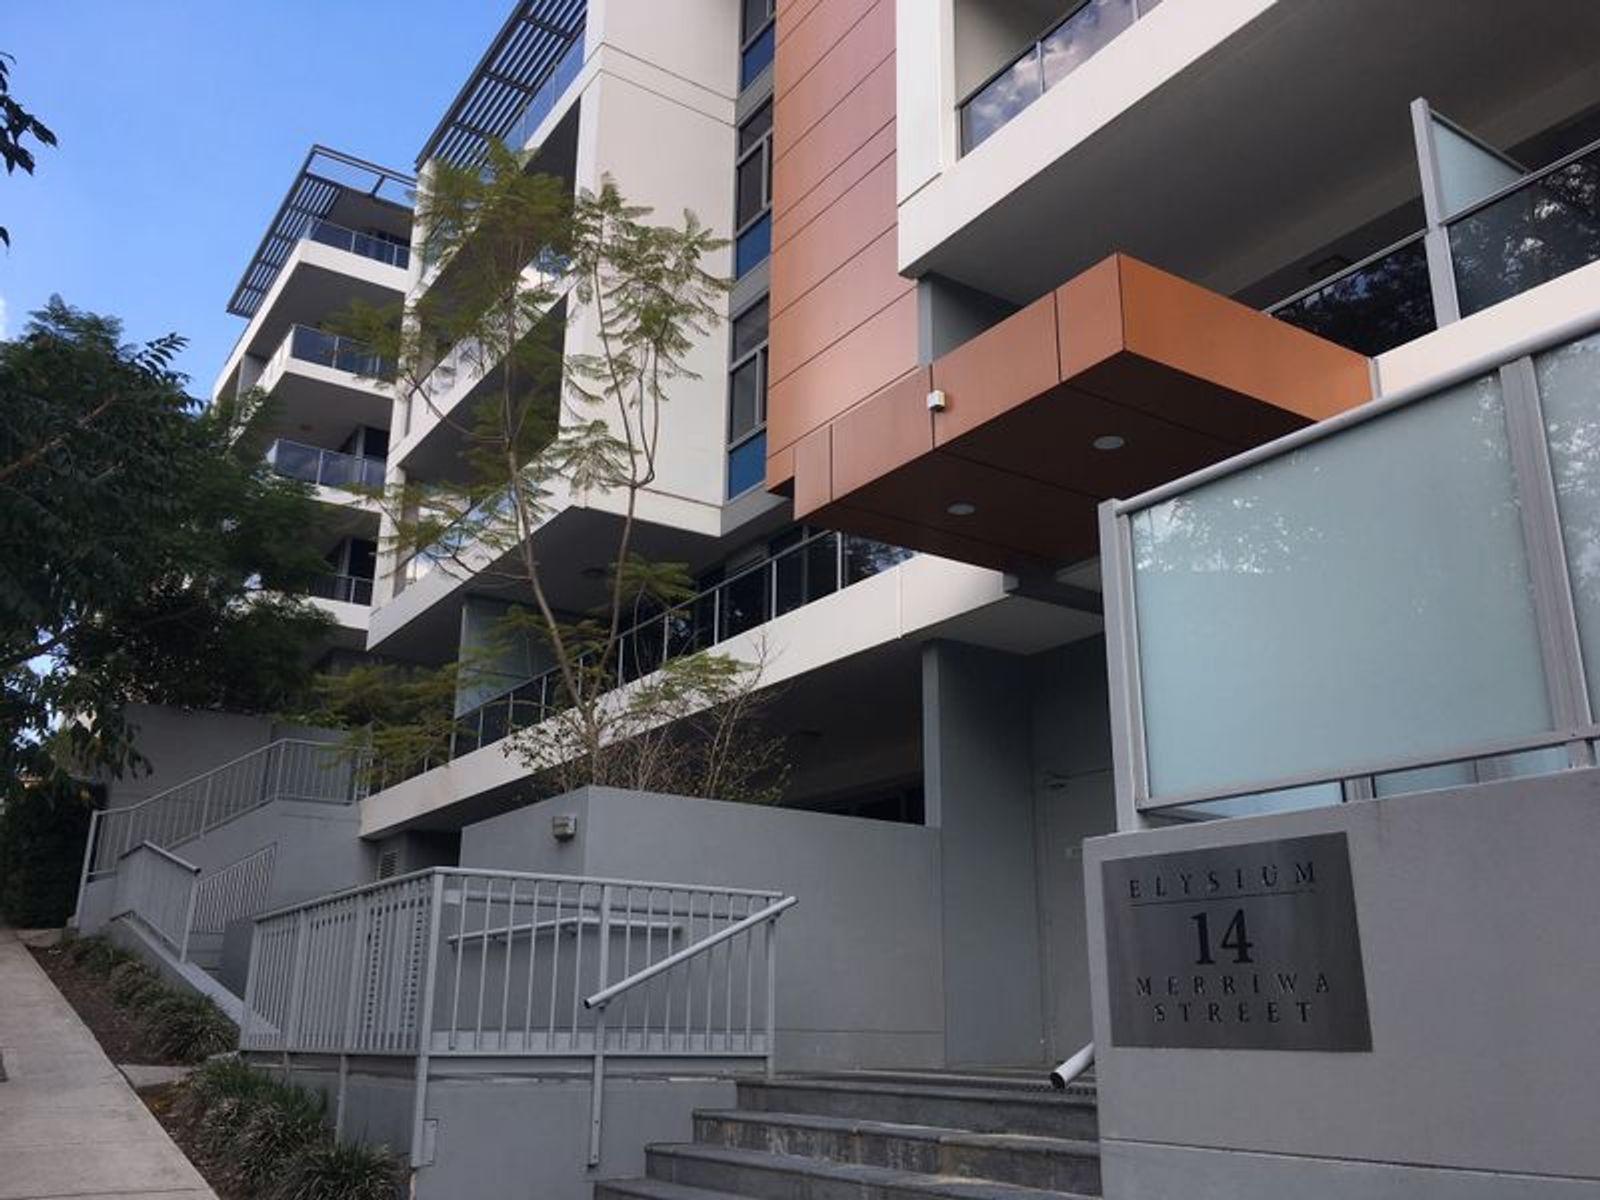 309/14 Merriwa Street Block A, Gordon, NSW 2072